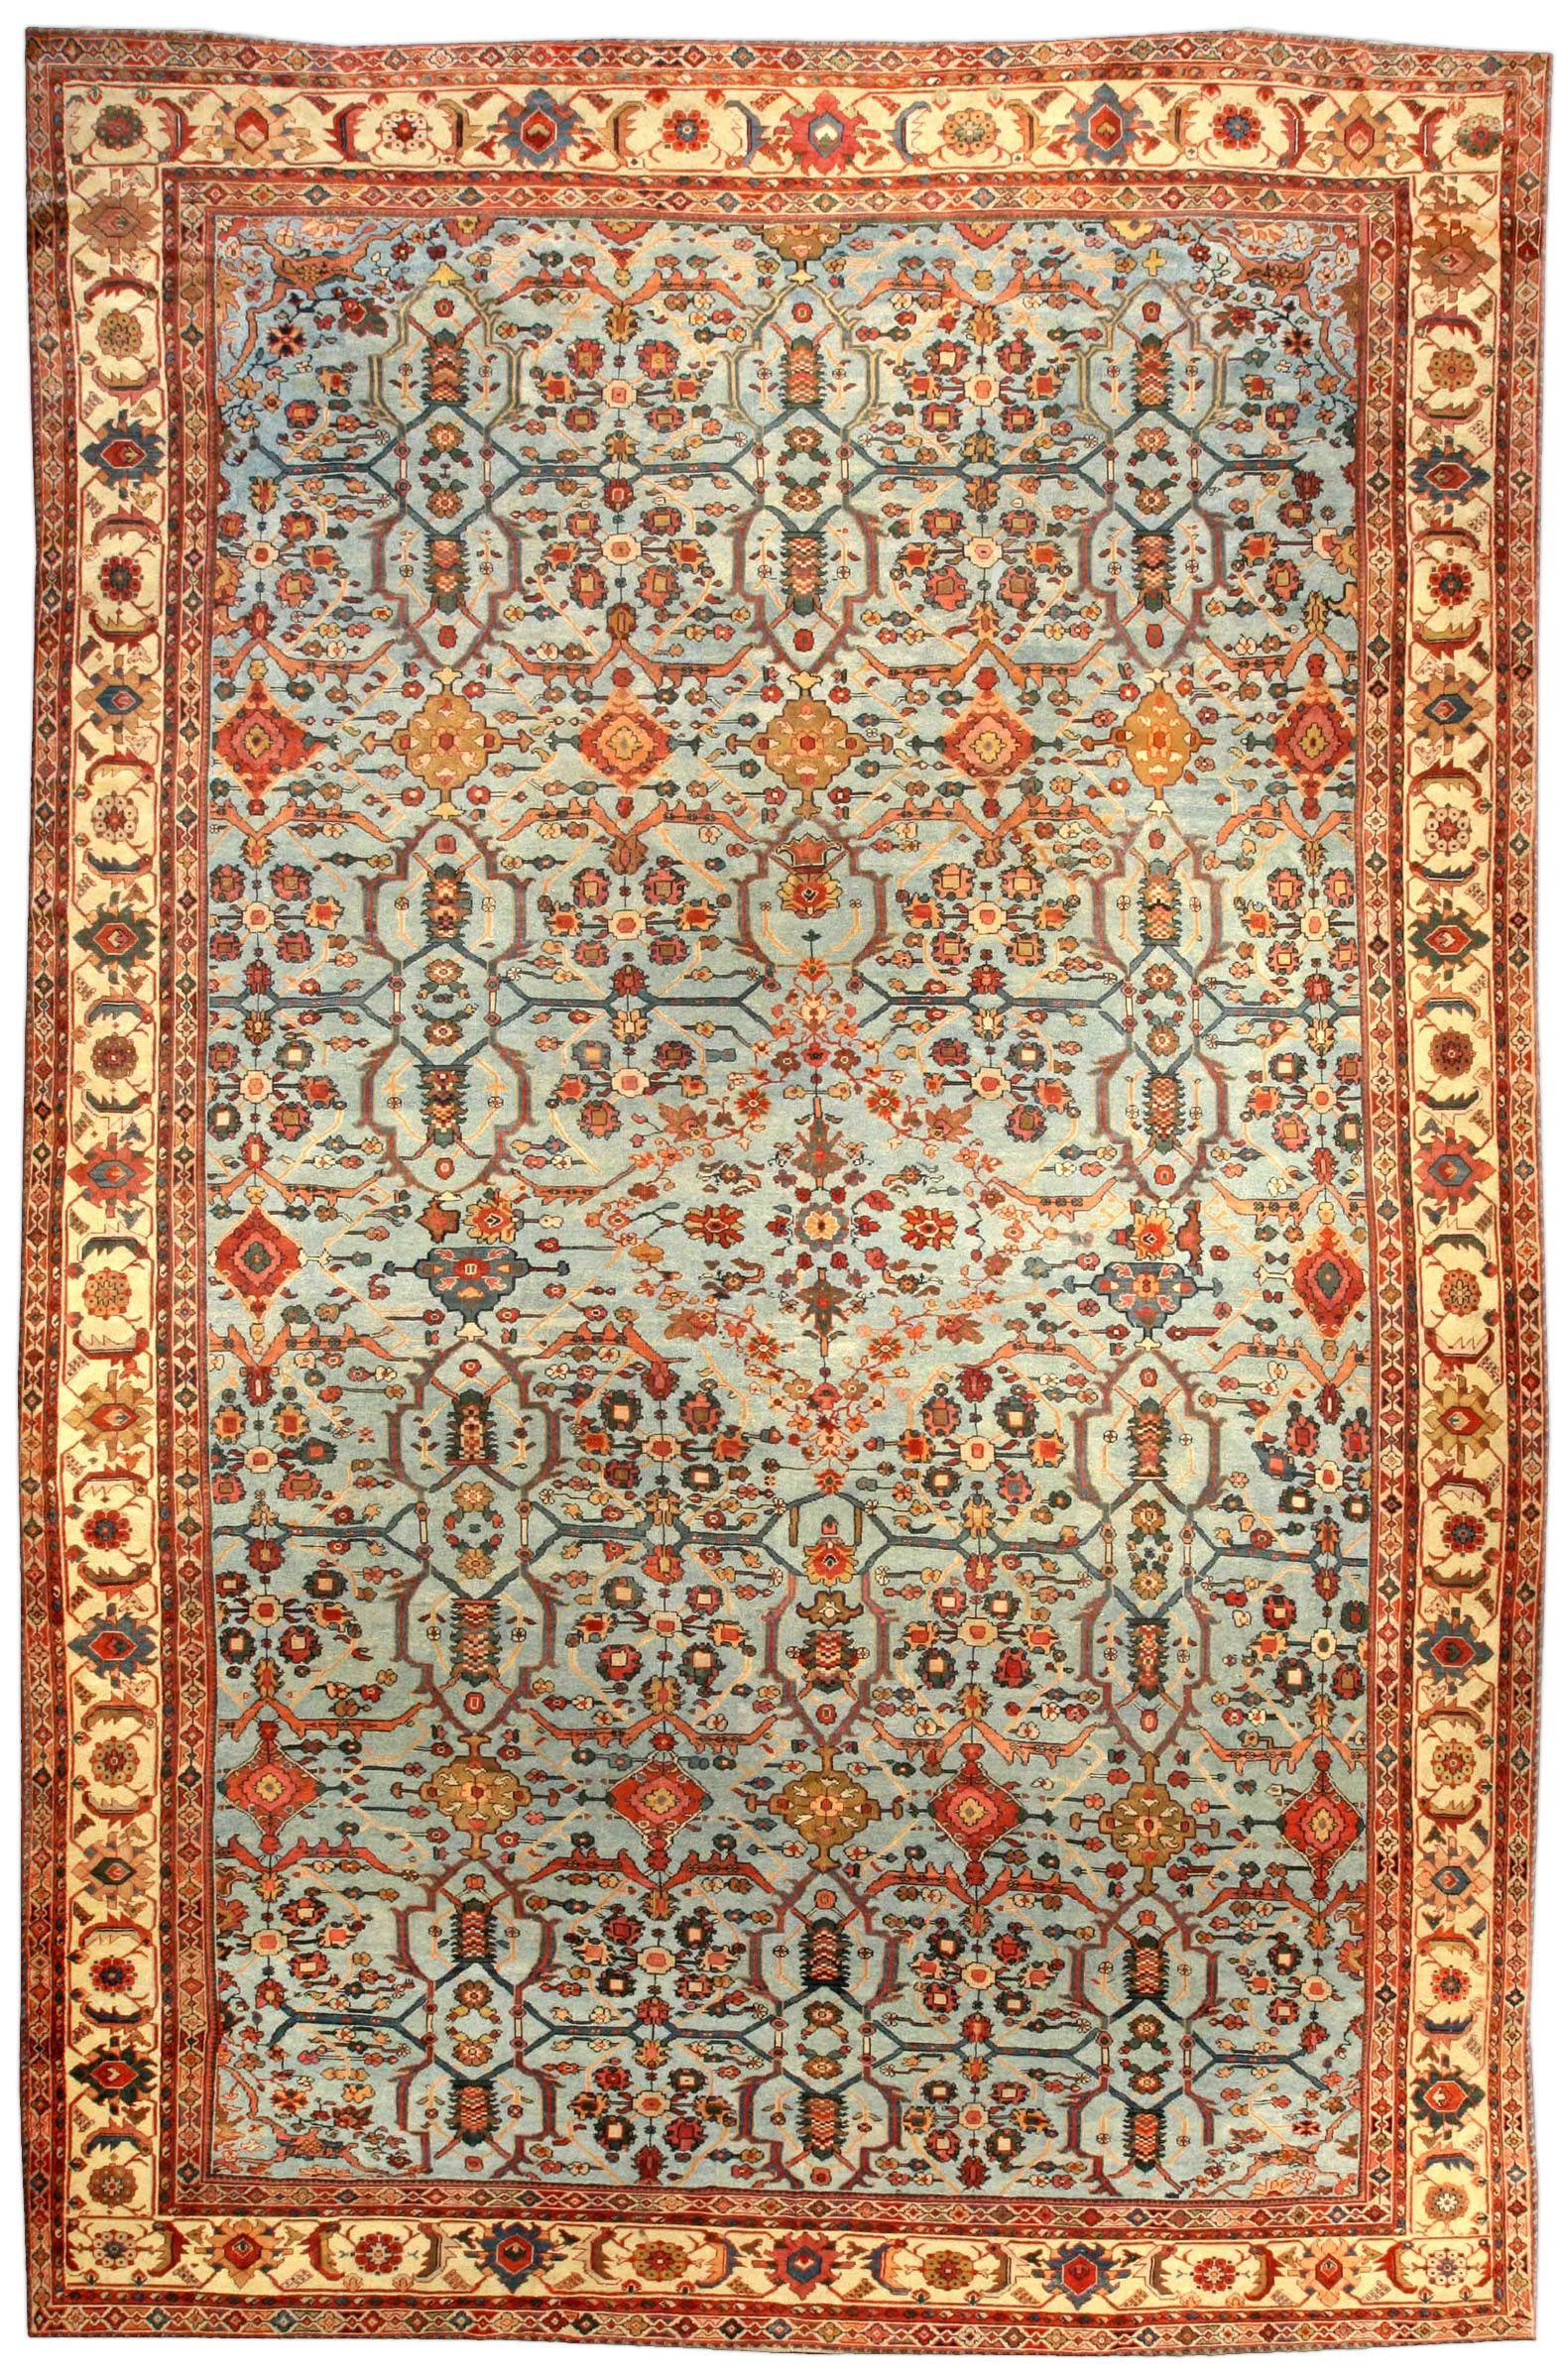 Iranian Carpet Persian Sultanabad Rug Antique Bb3941 By Doris Leslie Blau